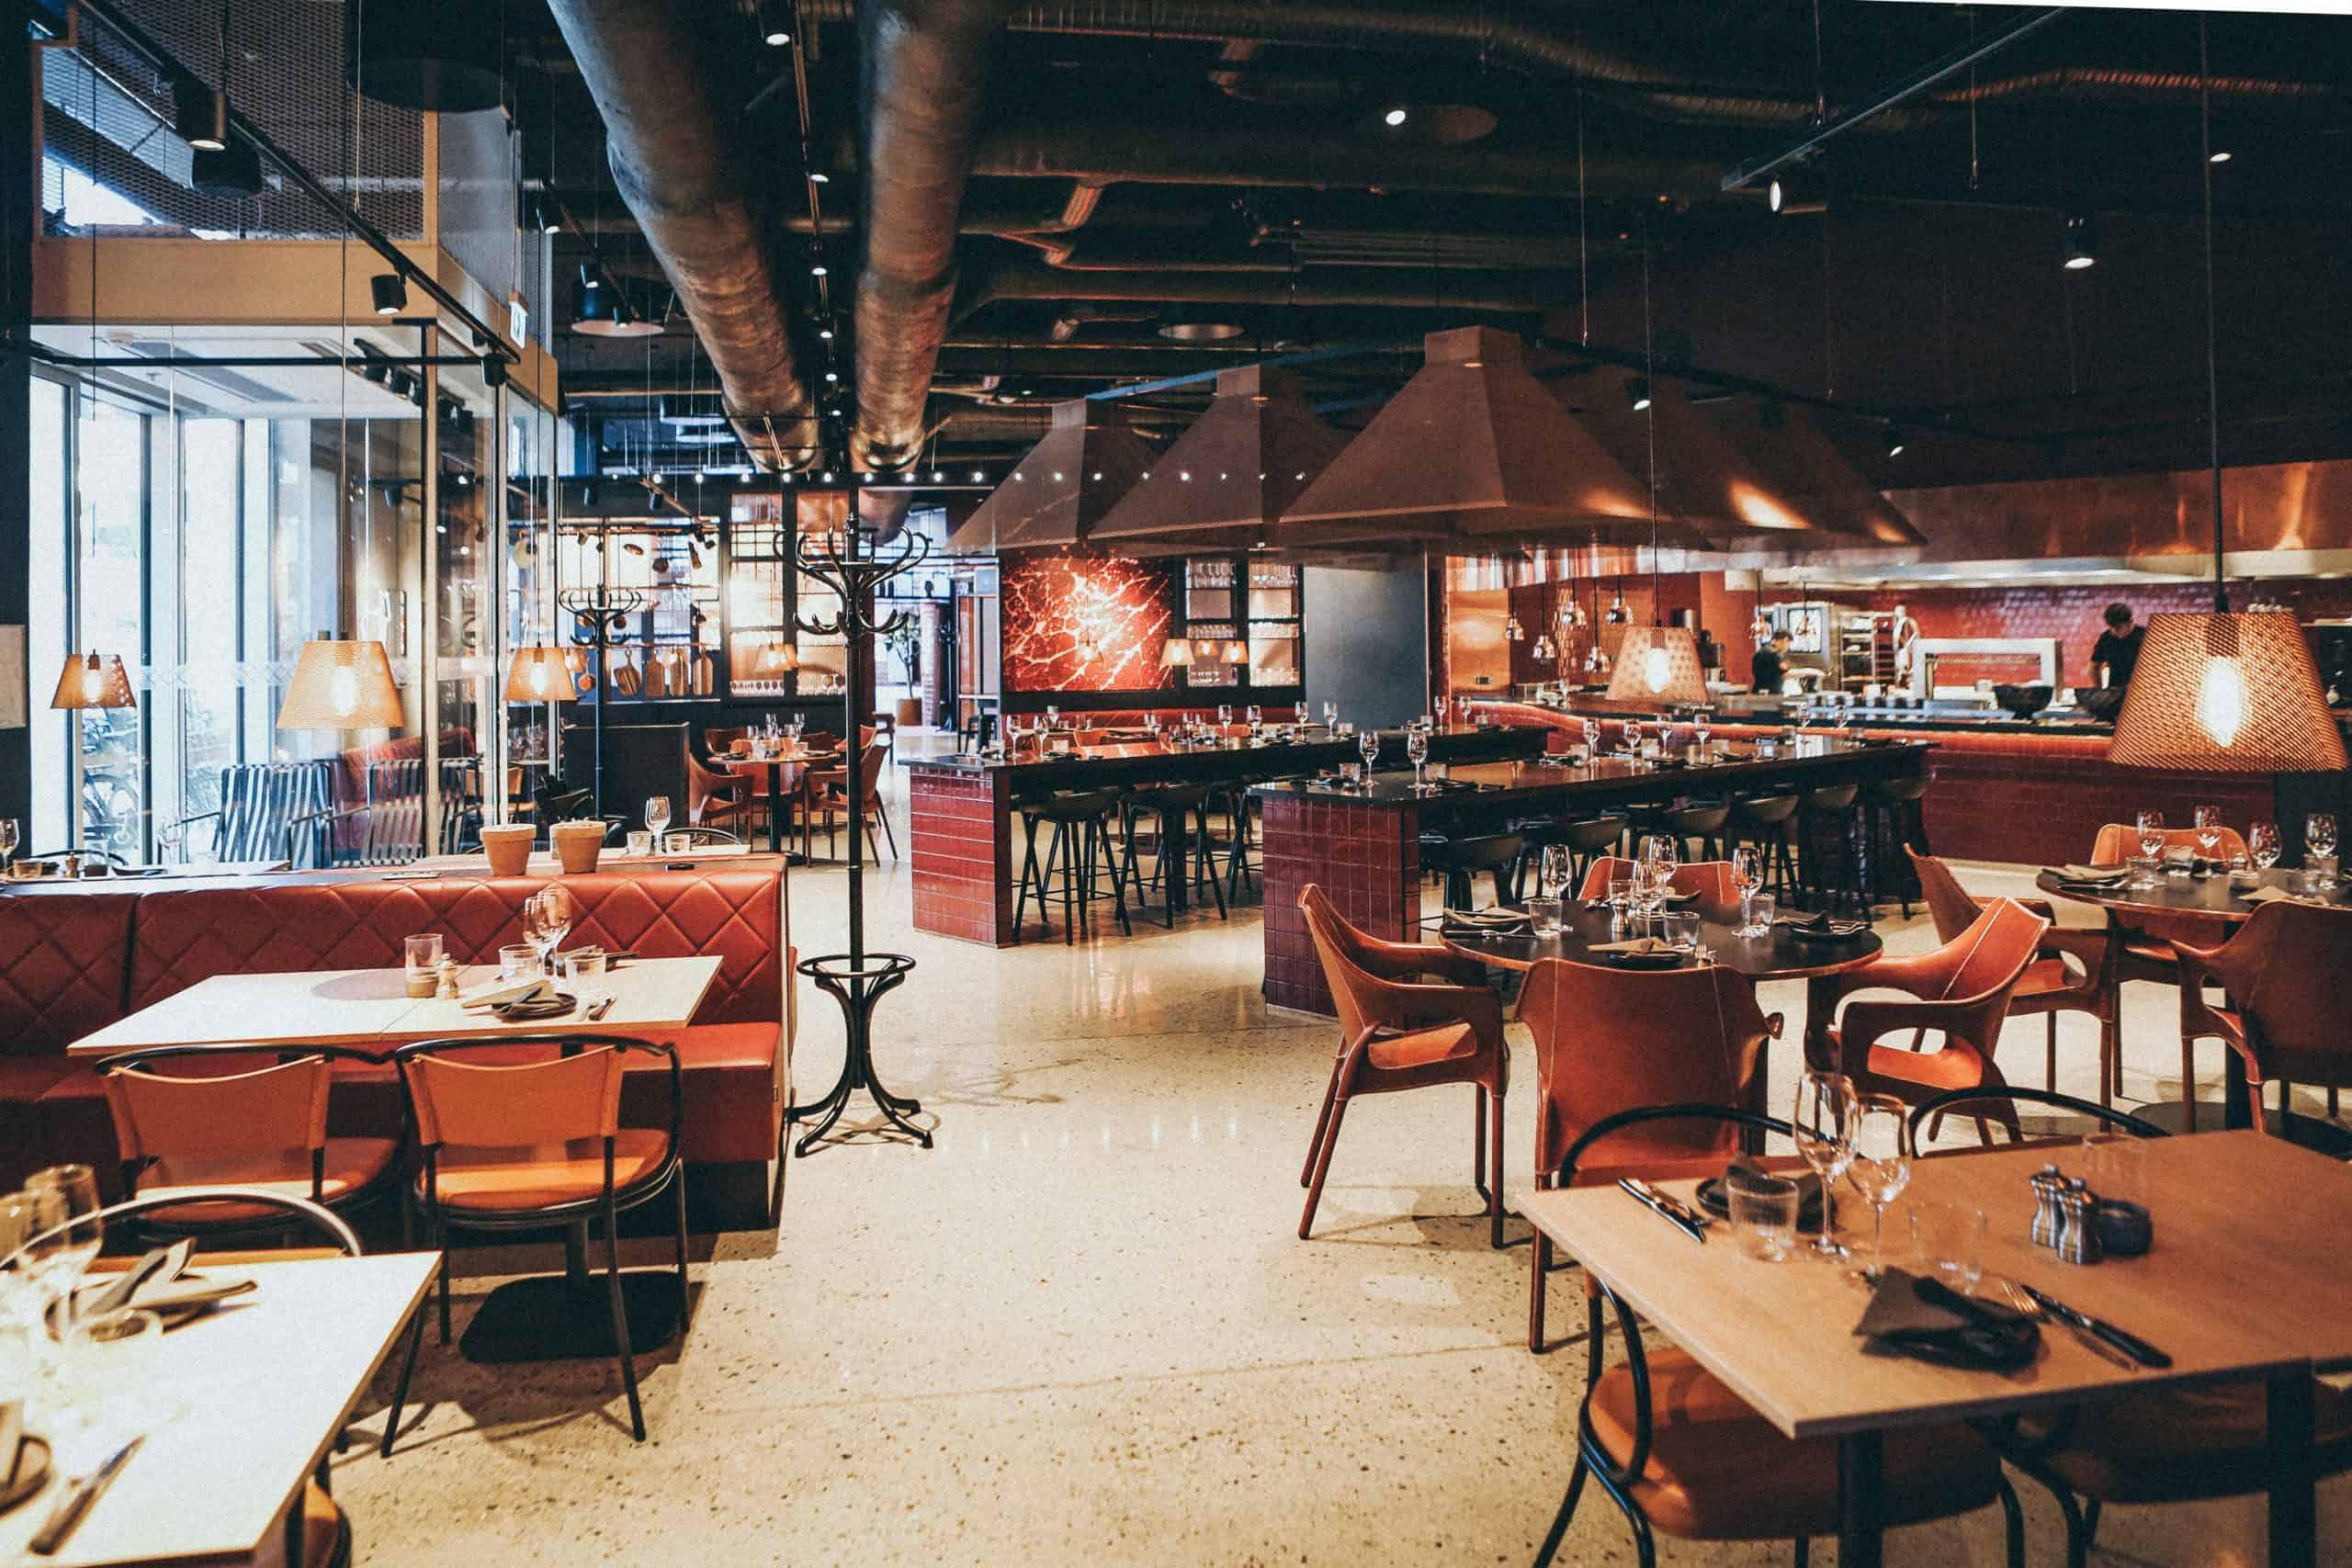 Best Restaurant Management course tutorial class certification training online